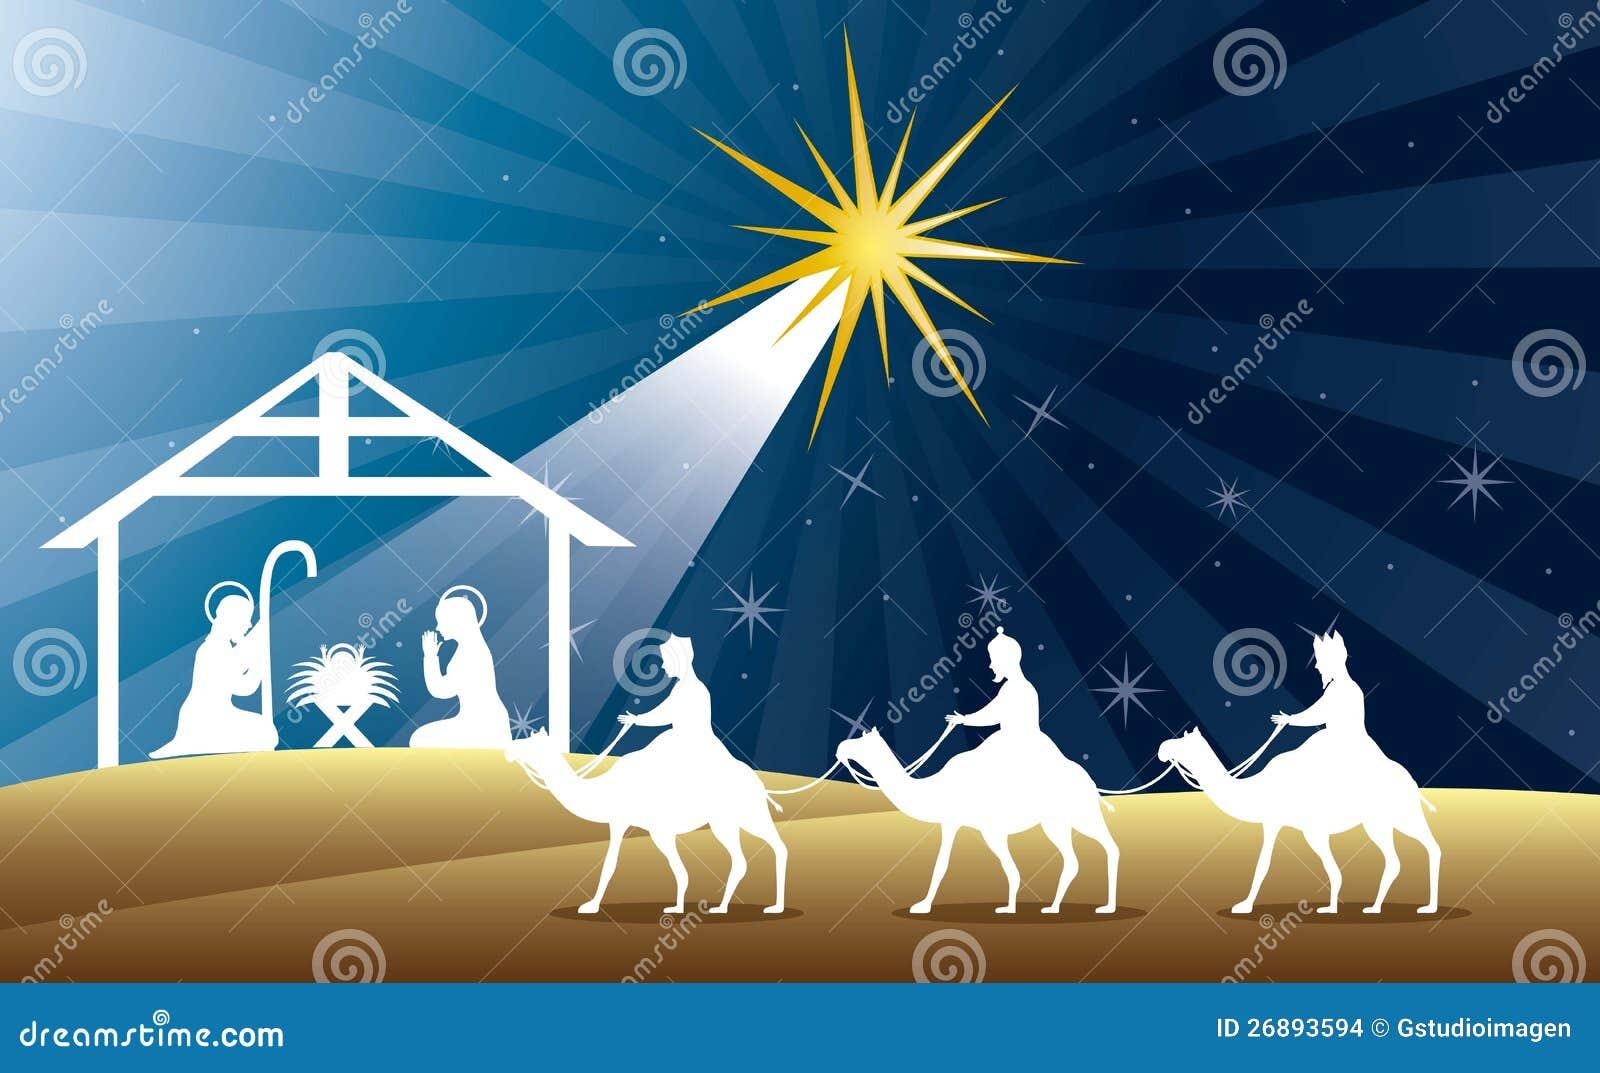 nativity scene stock vector illustration of holiday bing free clip art christmas bing free clip art february